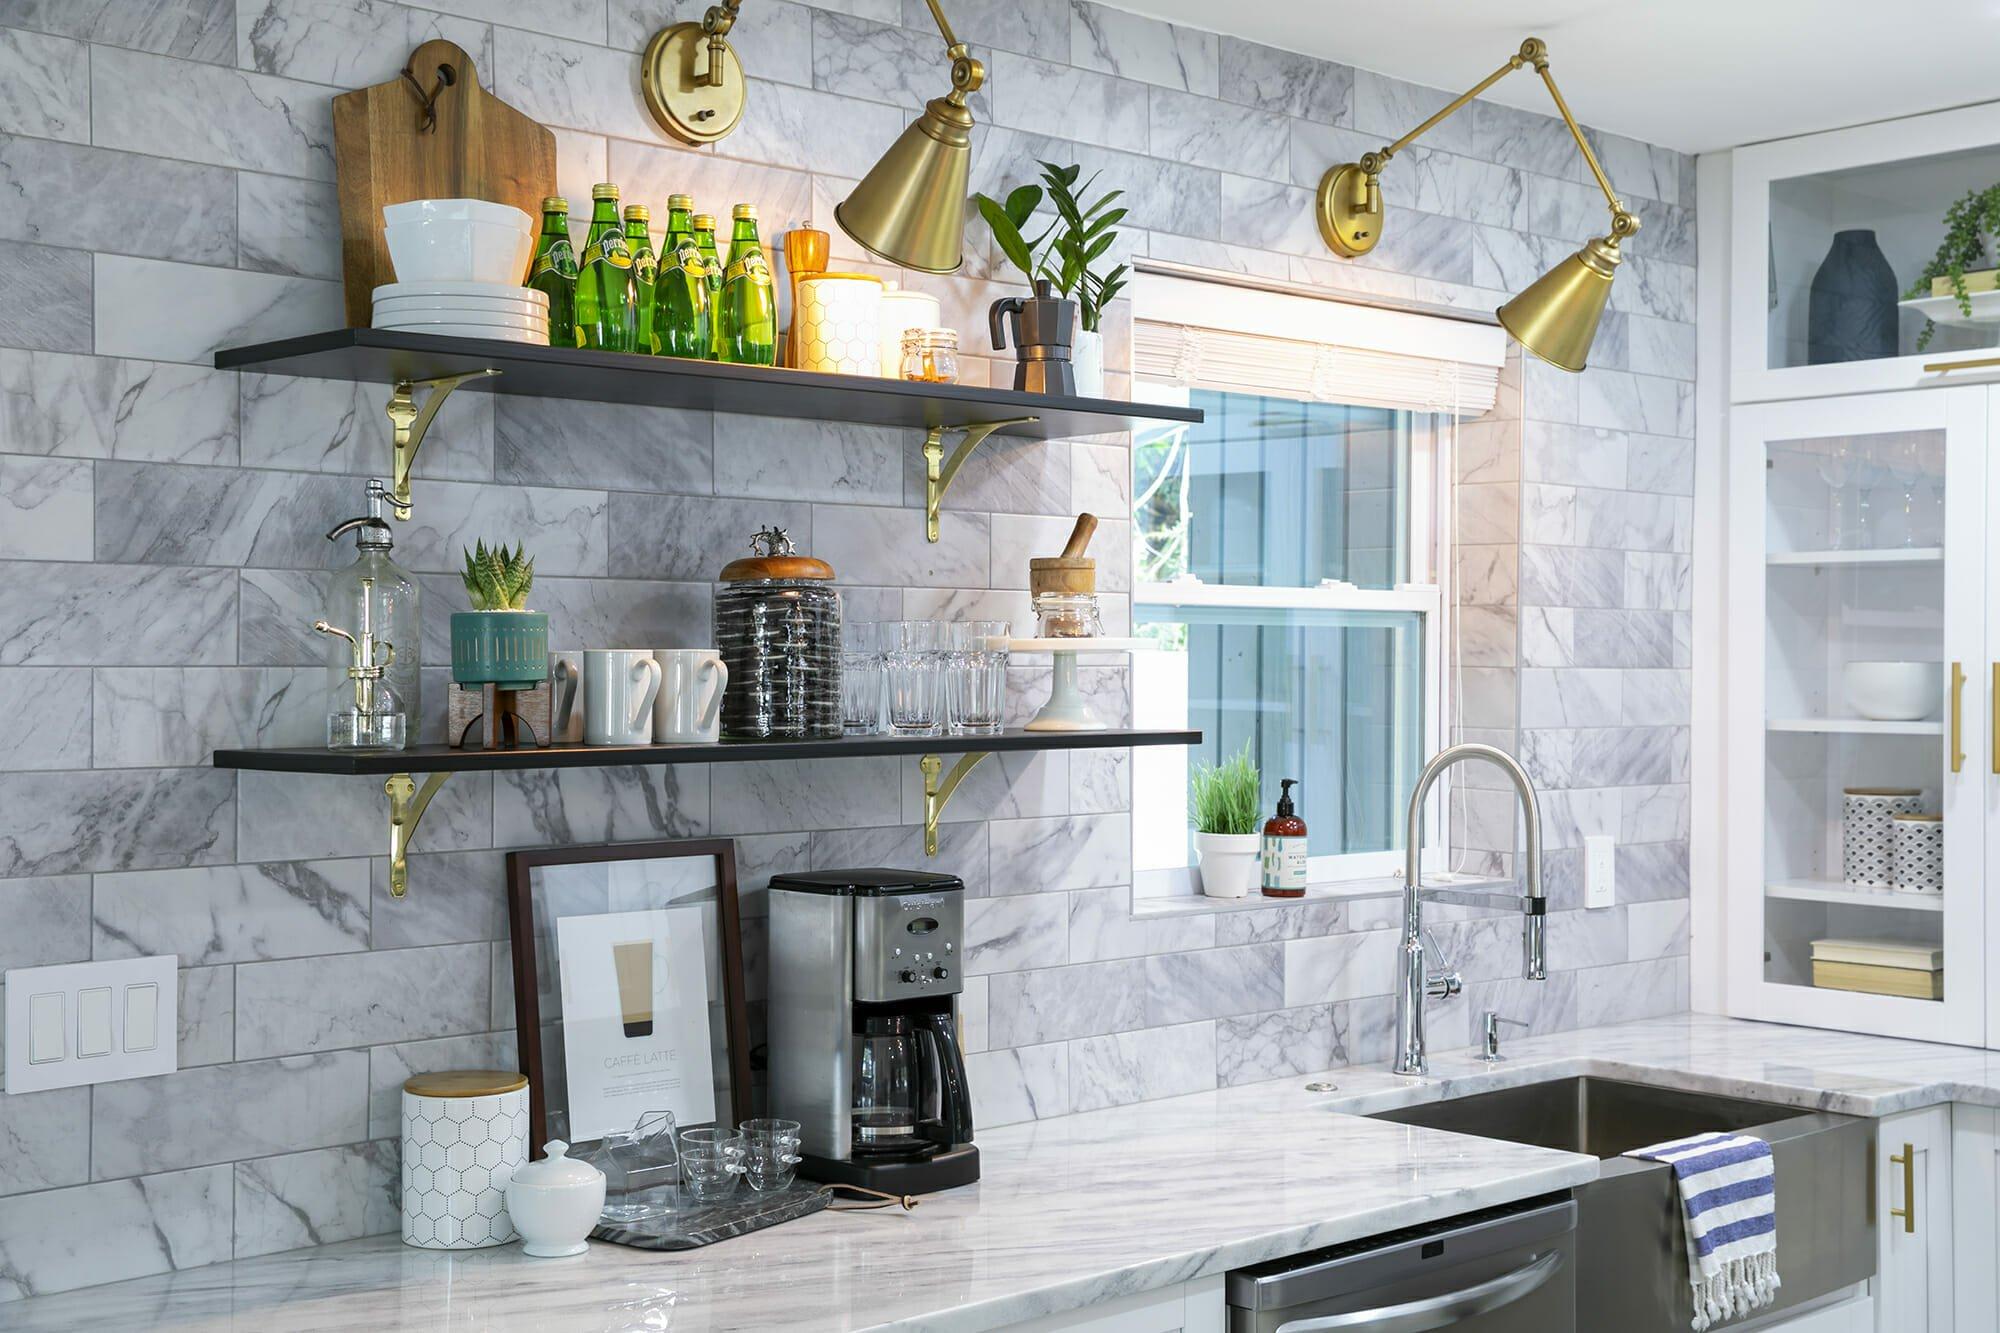 affordable interior design decorilla kitchen deisgn accessories